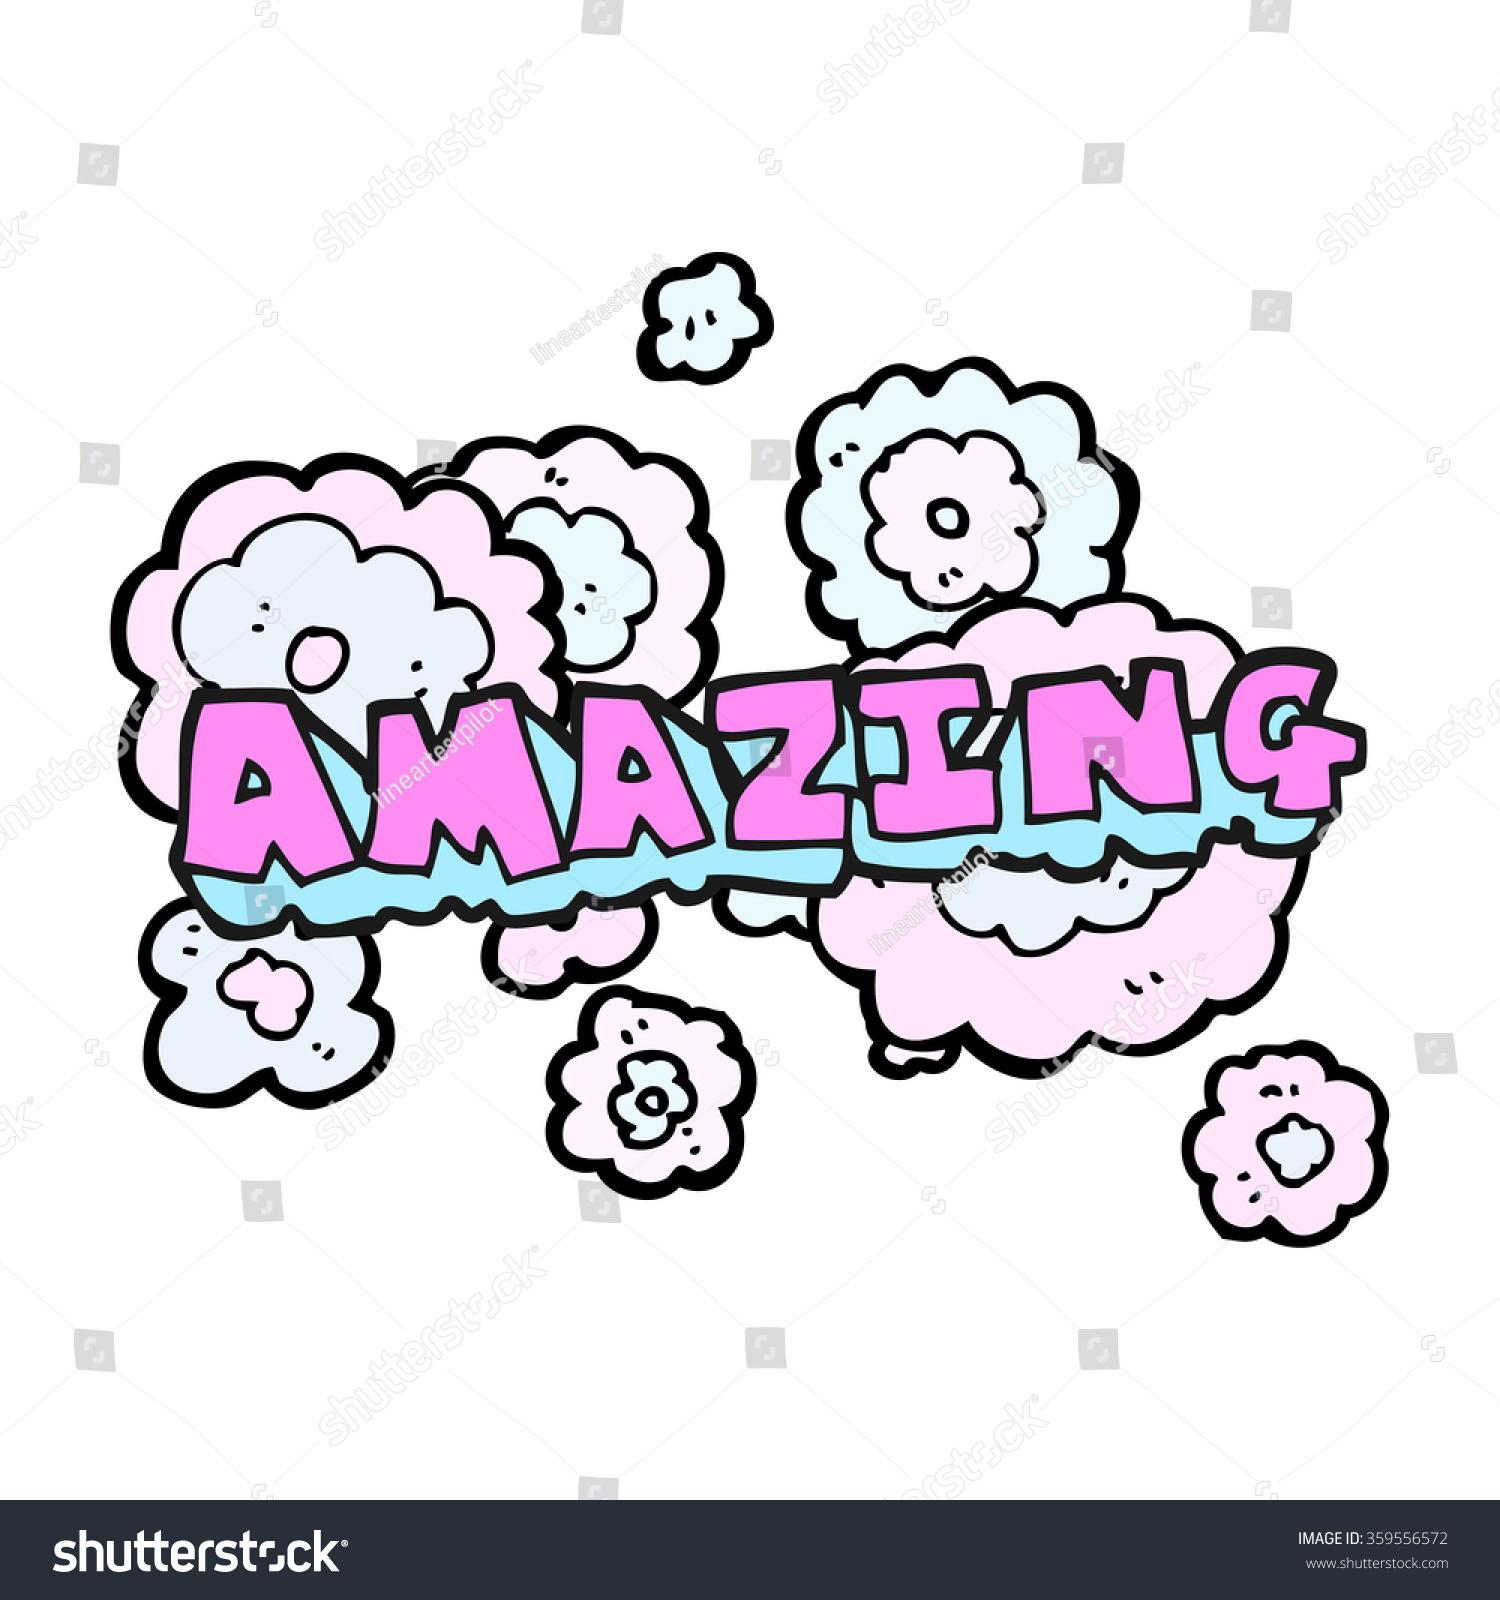 The Word Amazing: Freehand Drawn Cartoon Amazing Word Stock Vector